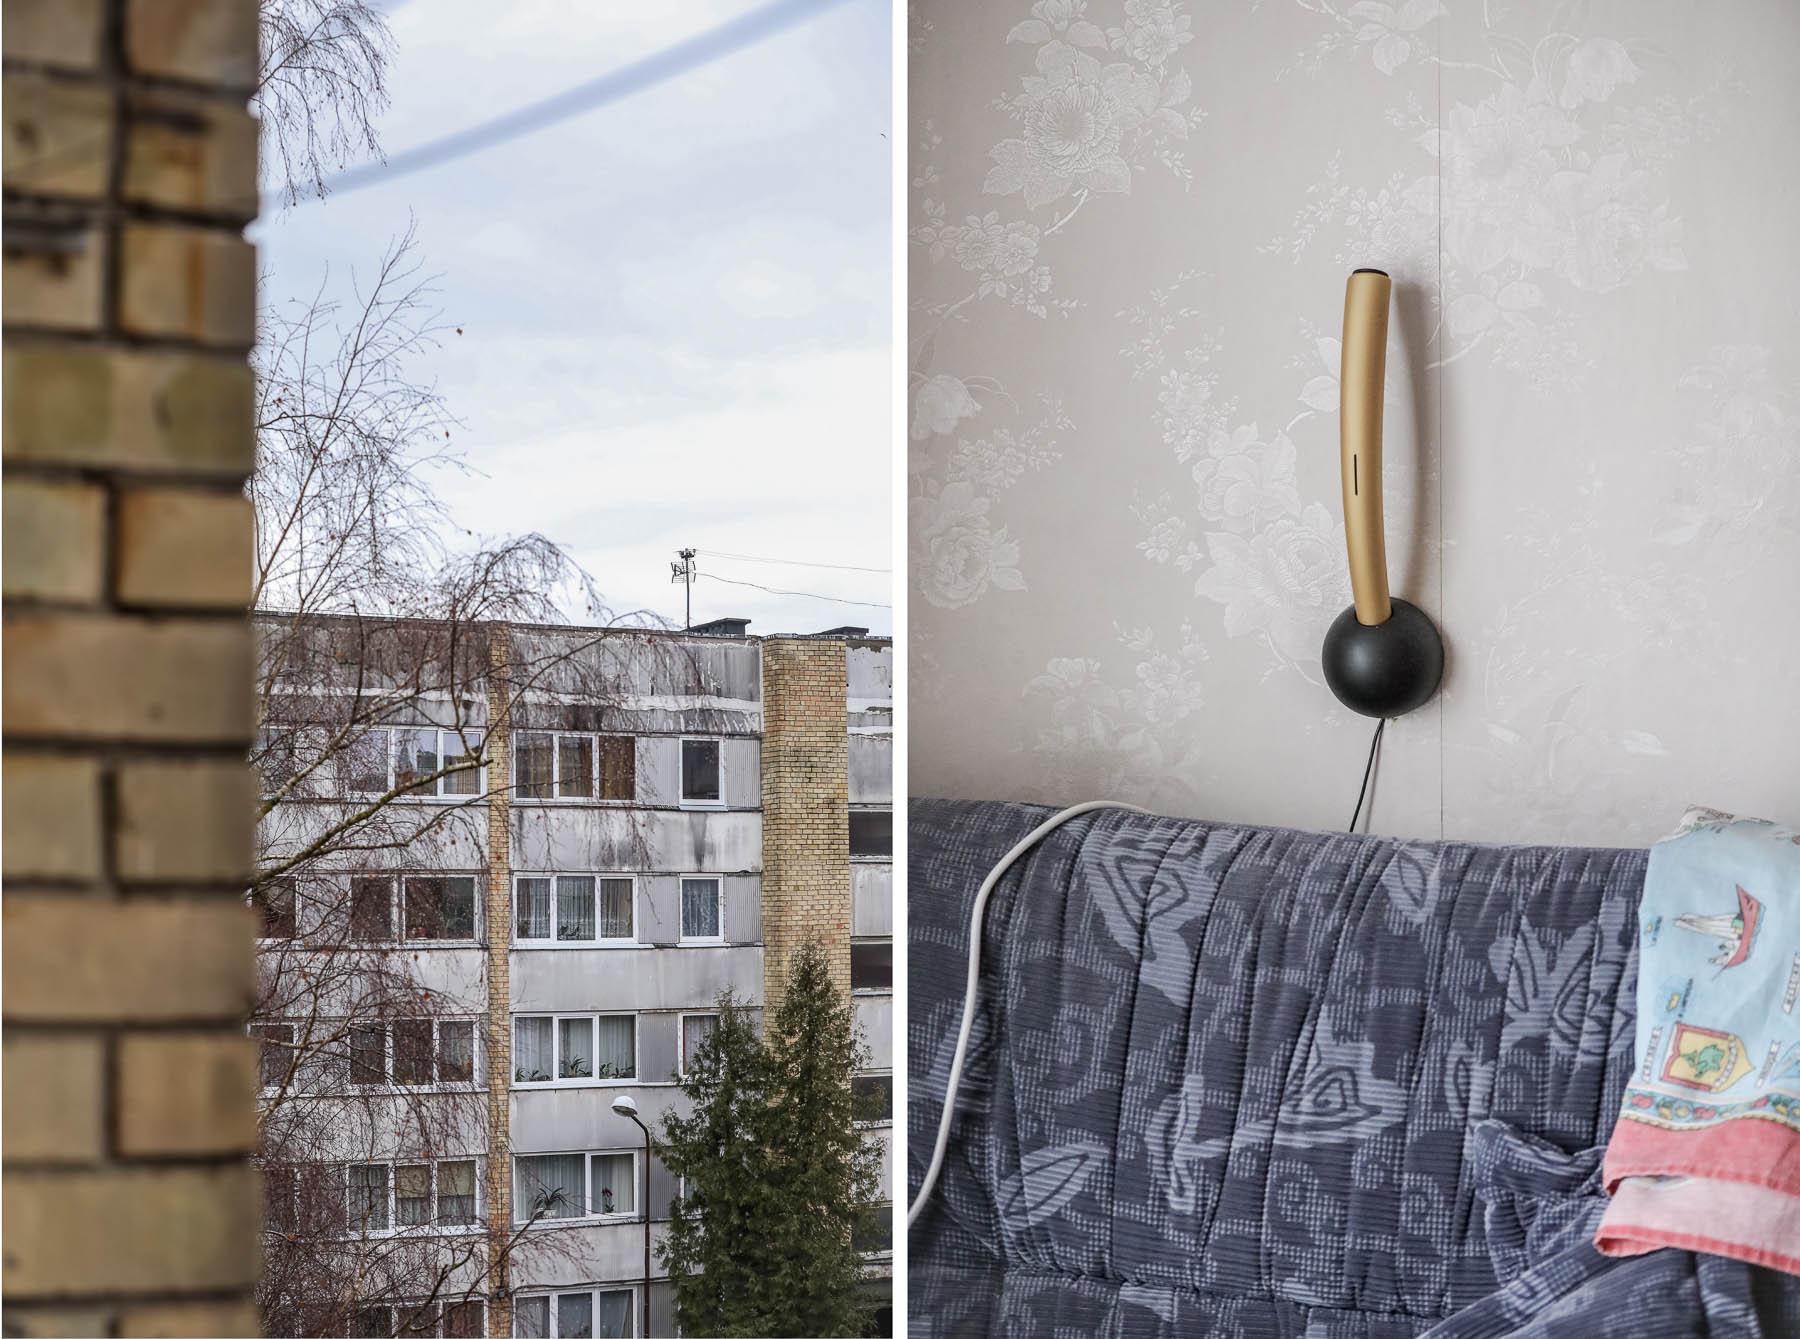 Landscape-cityscape-photography-jelgava-latvia-blocs-blocks-flat-post-soviet--Советские-квартиры-спальный-район-Латвия-город-фотограф-natalia-smith-photography-0115.jpg